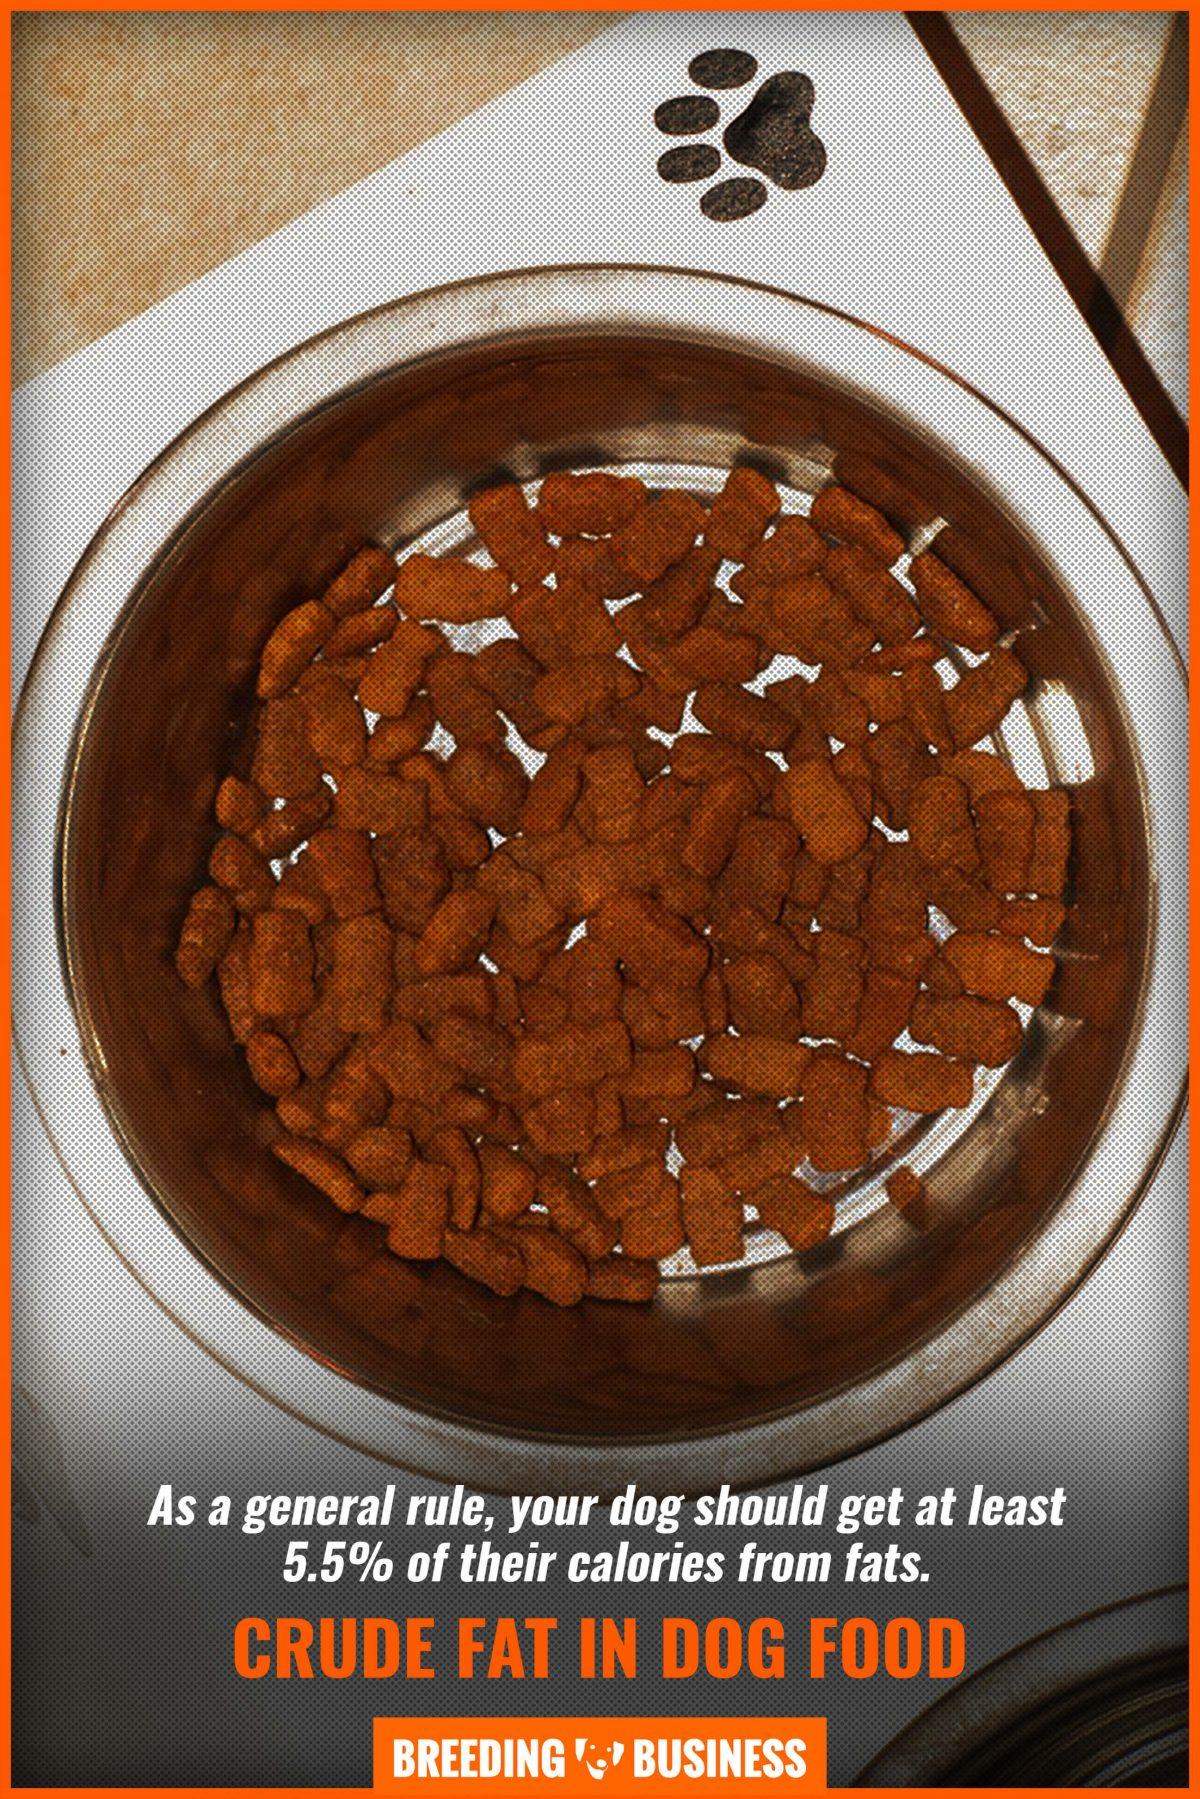 crude fat in dog food